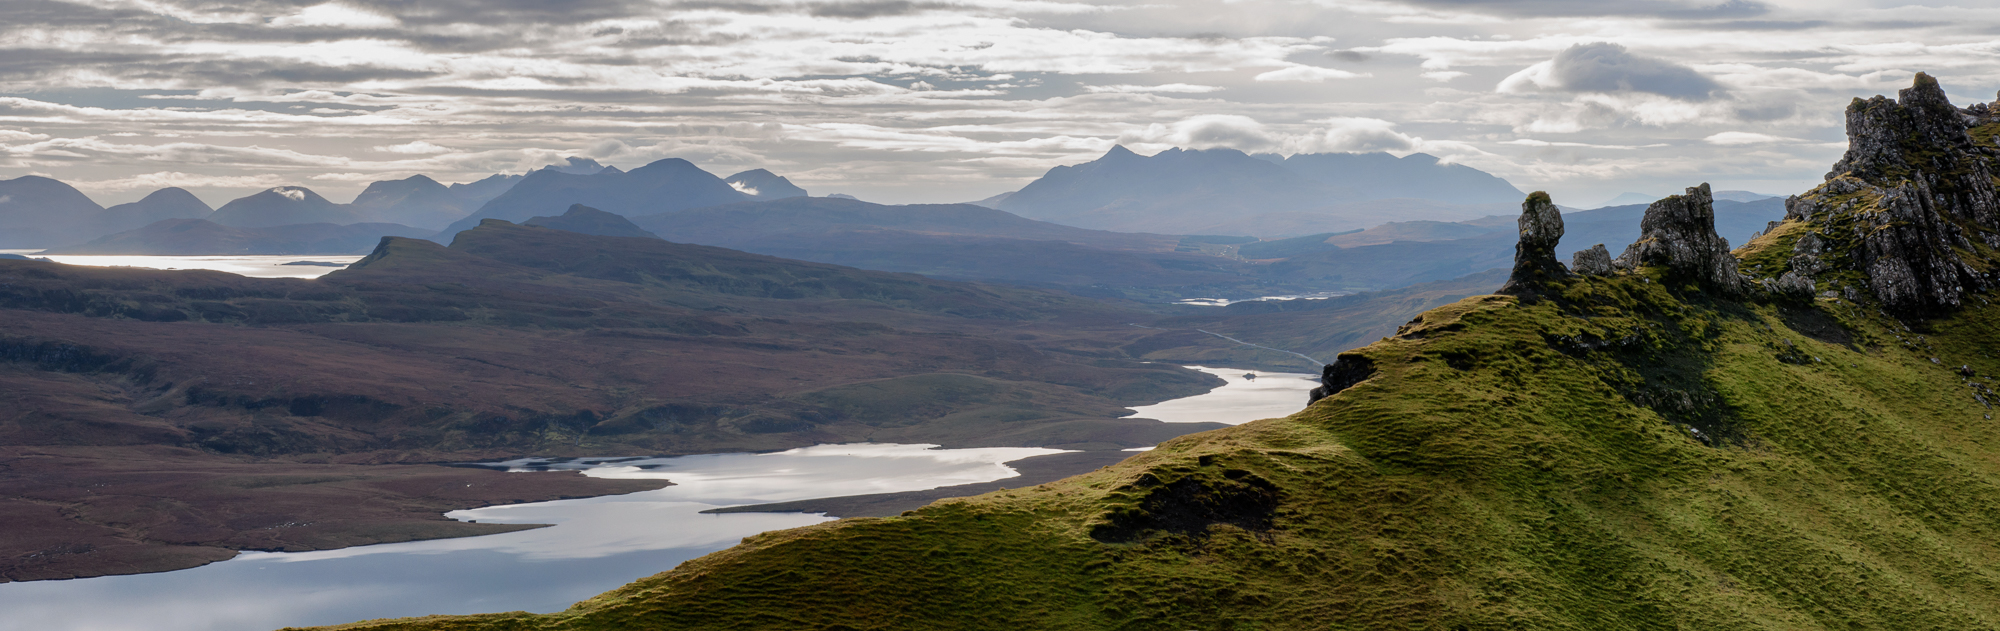 scotlandwalesweb_05-Edit.jpg